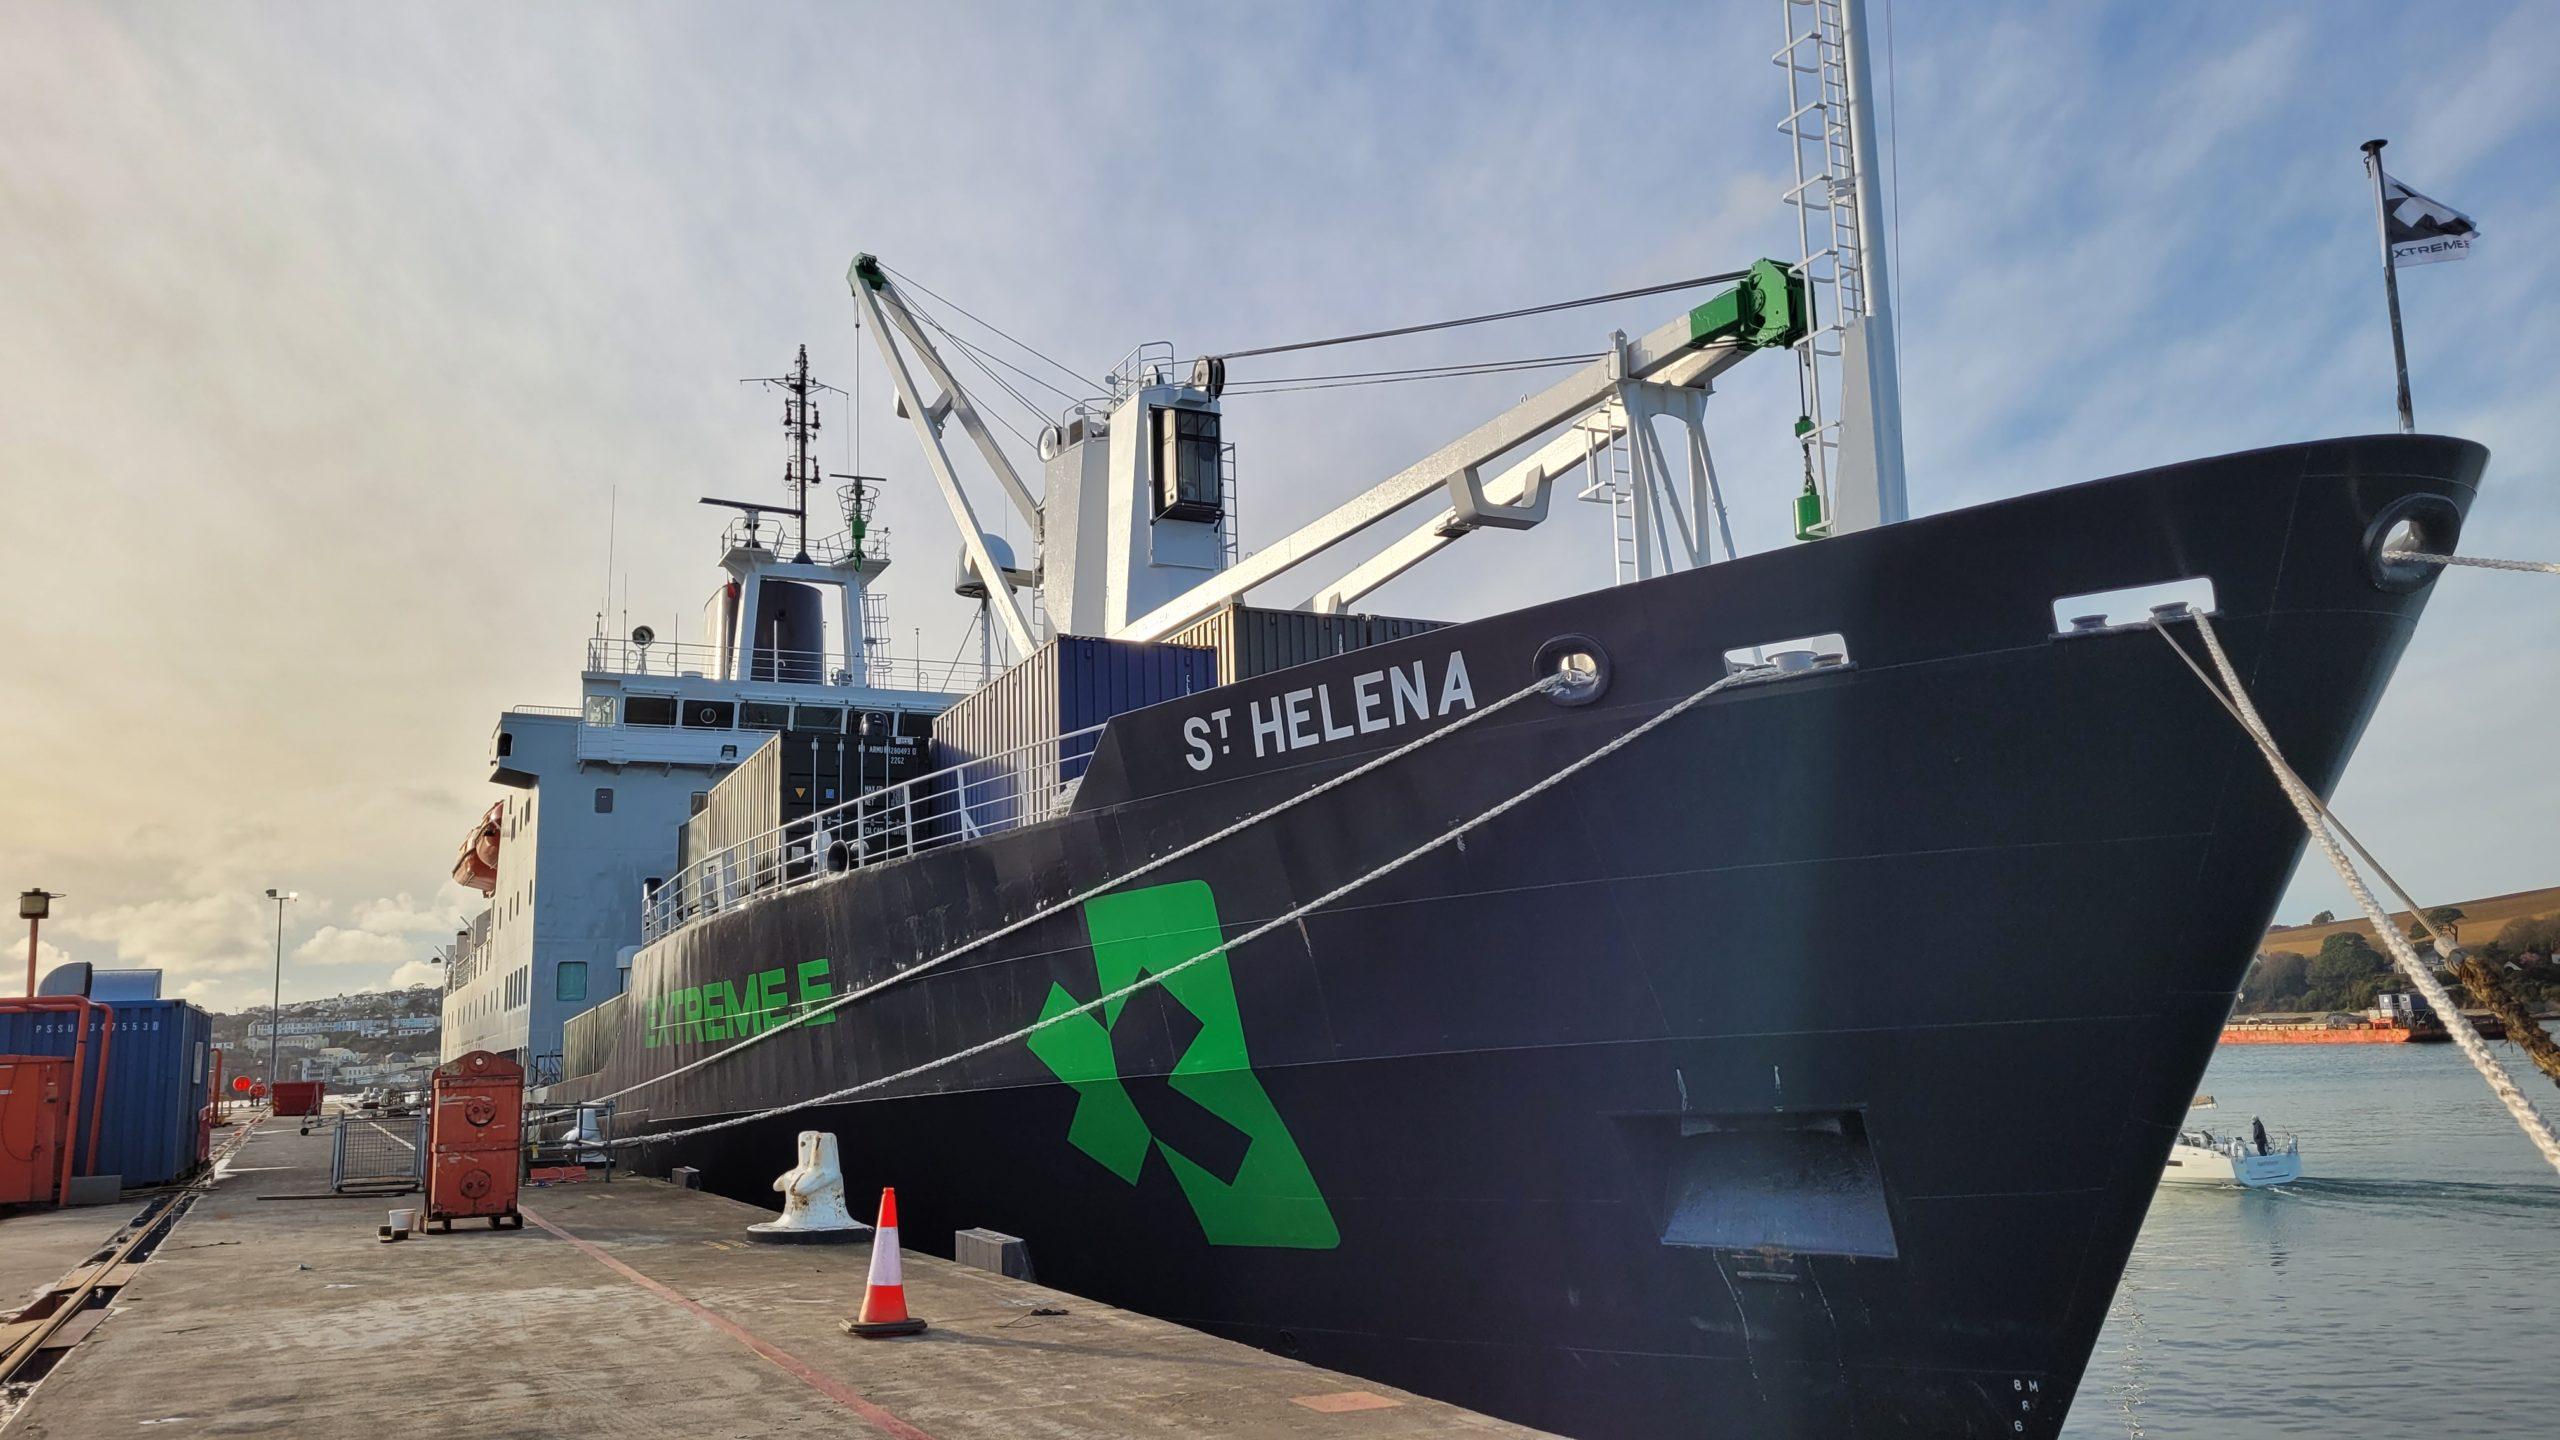 Extreme E y Enel Foundation revelan primer proyecto de investigación científica a bordo del St. Helena